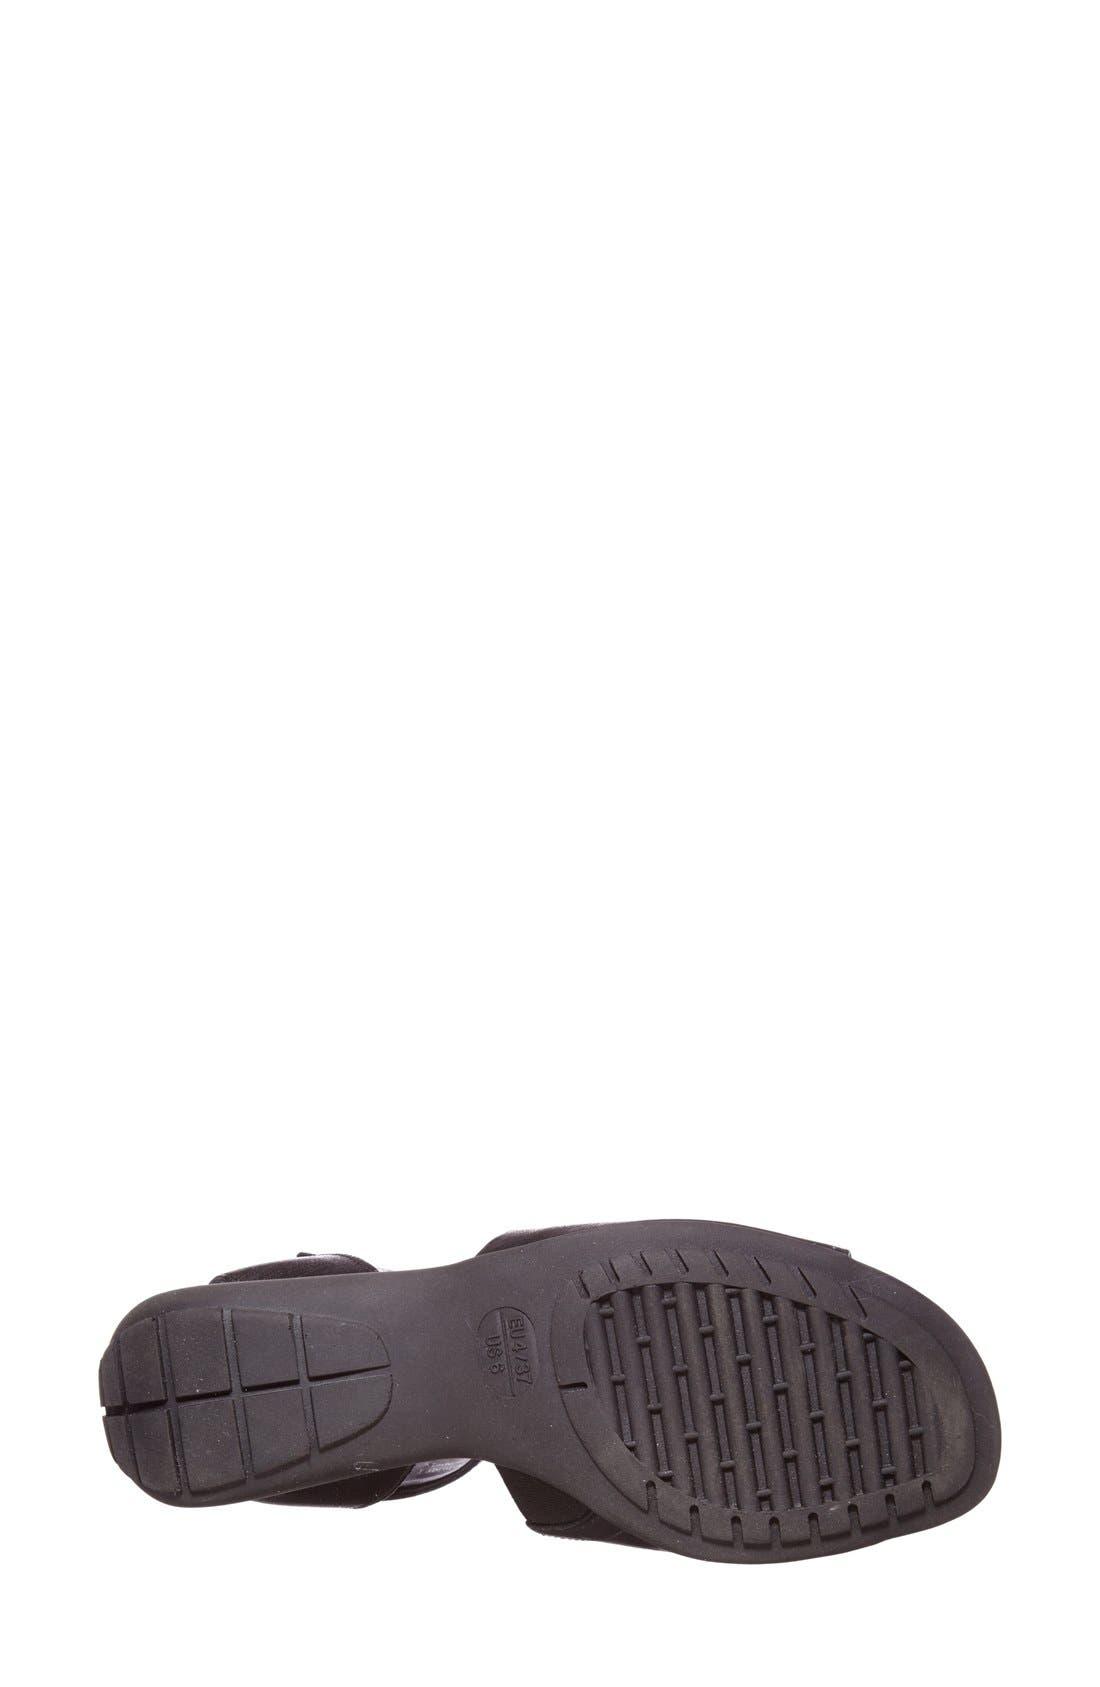 Alternate Image 4  - The FLEXX 'Beglad' Leather Ankle Strap Sandal